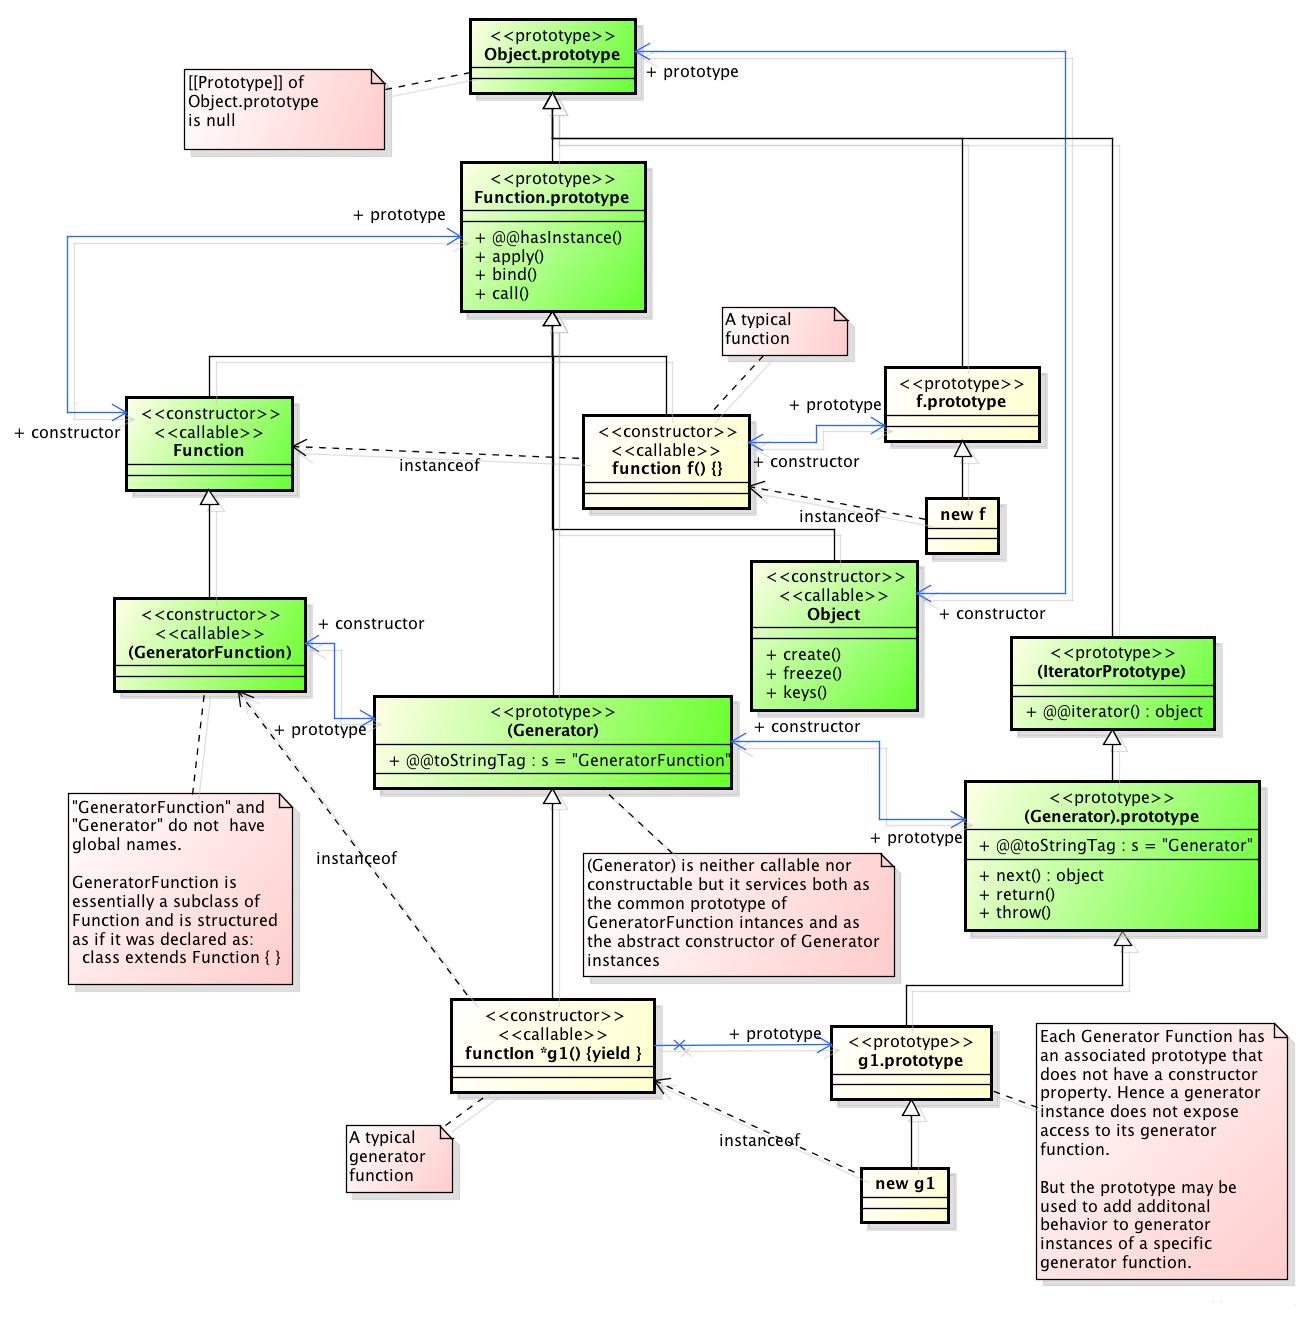 Figure 2 — Generator Objects Relationships